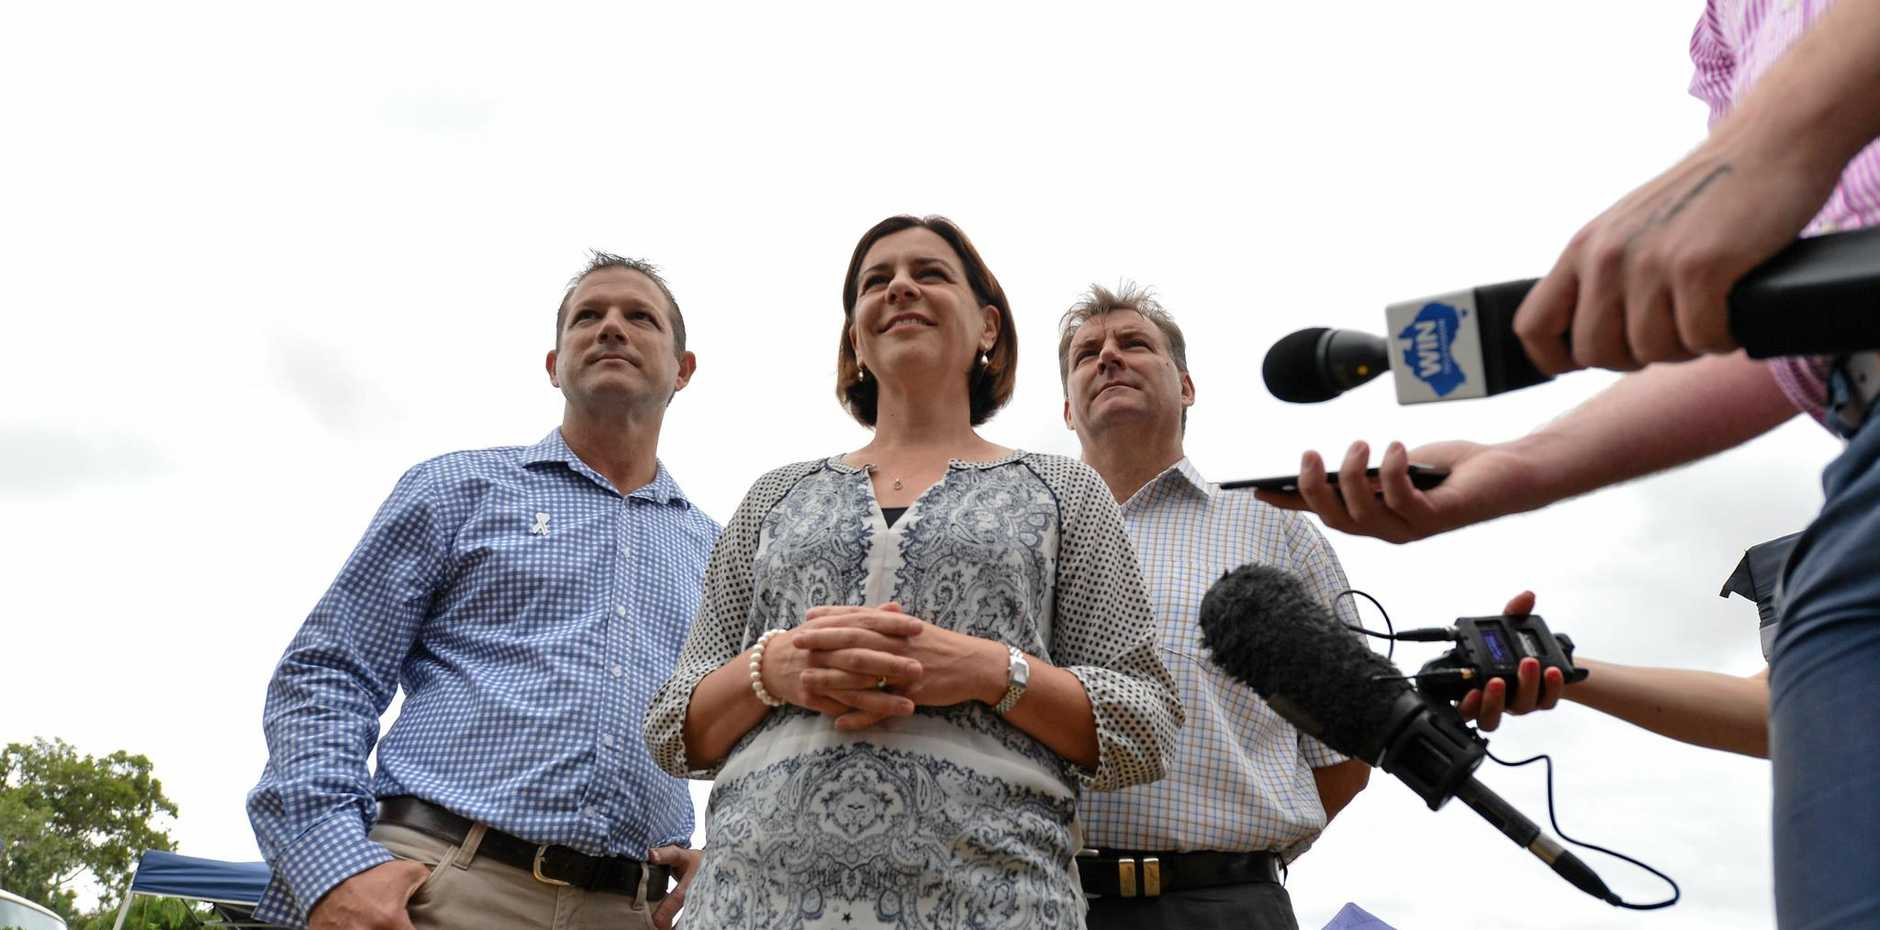 Queensland Deputy Opposition Leader Deb Frecklington at Shalom Markets with Cr David Batt, the new LNP candidate for Bundaberg, and Member for Burnett Stephen Bennett. Ms Frecklington was in Bundaberg to add weight to Cr Batt's campaign.